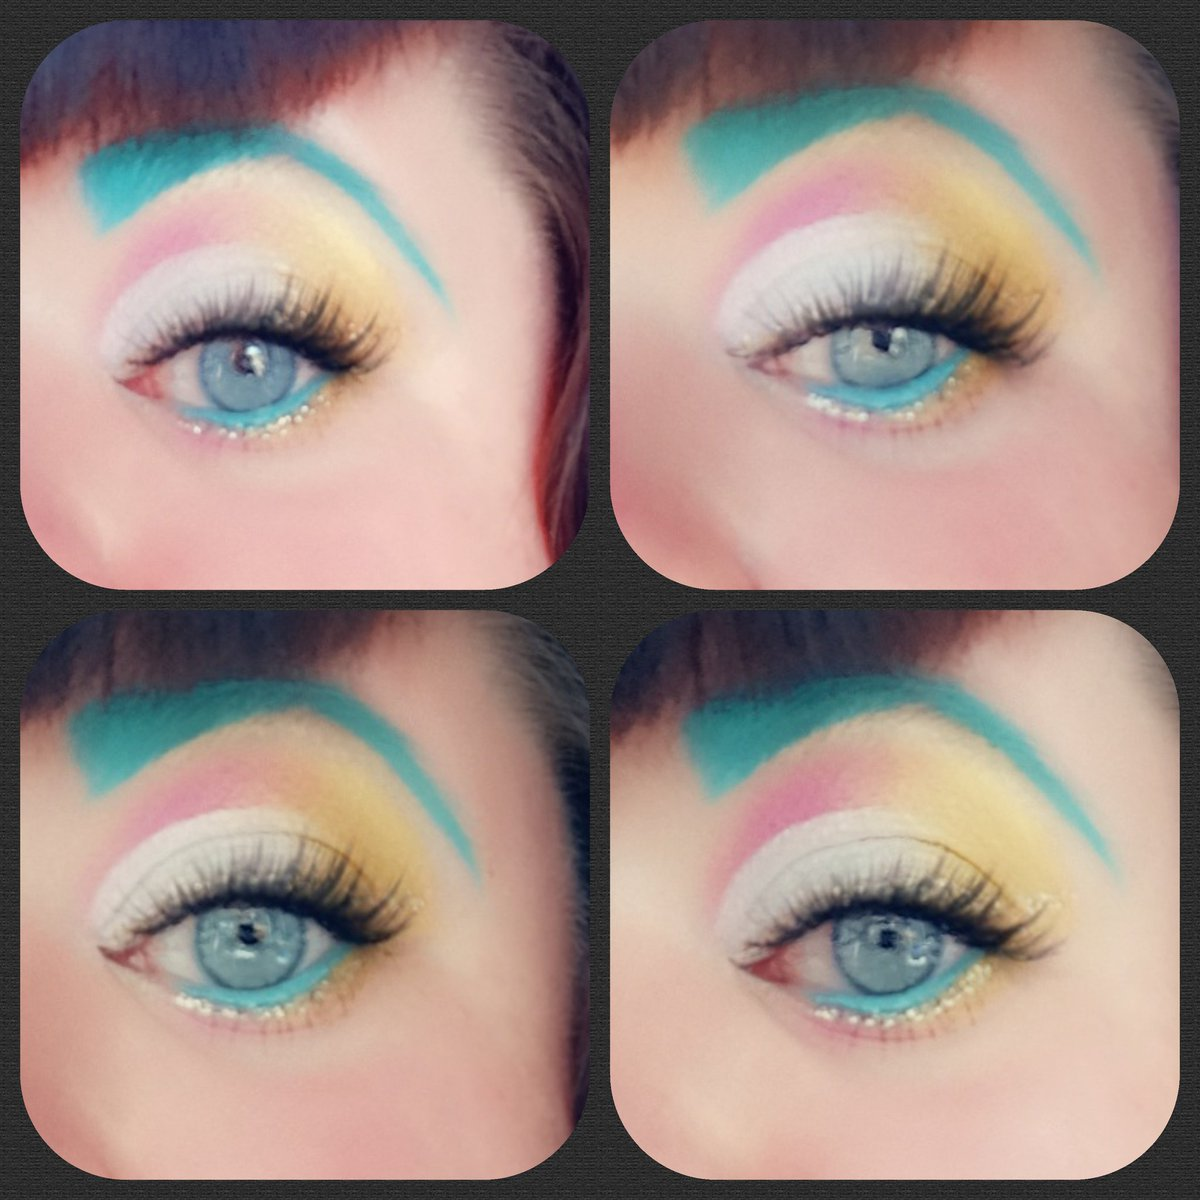 Pink, silver and golds today! #jeffreestar #JeffreeStarCosmetics #jeffreestarprlist #makeup #makeupartist #makeupbyme #makeupaddict #cutcrease @JeffreeStarpic.twitter.com/YKdPMkA4SD